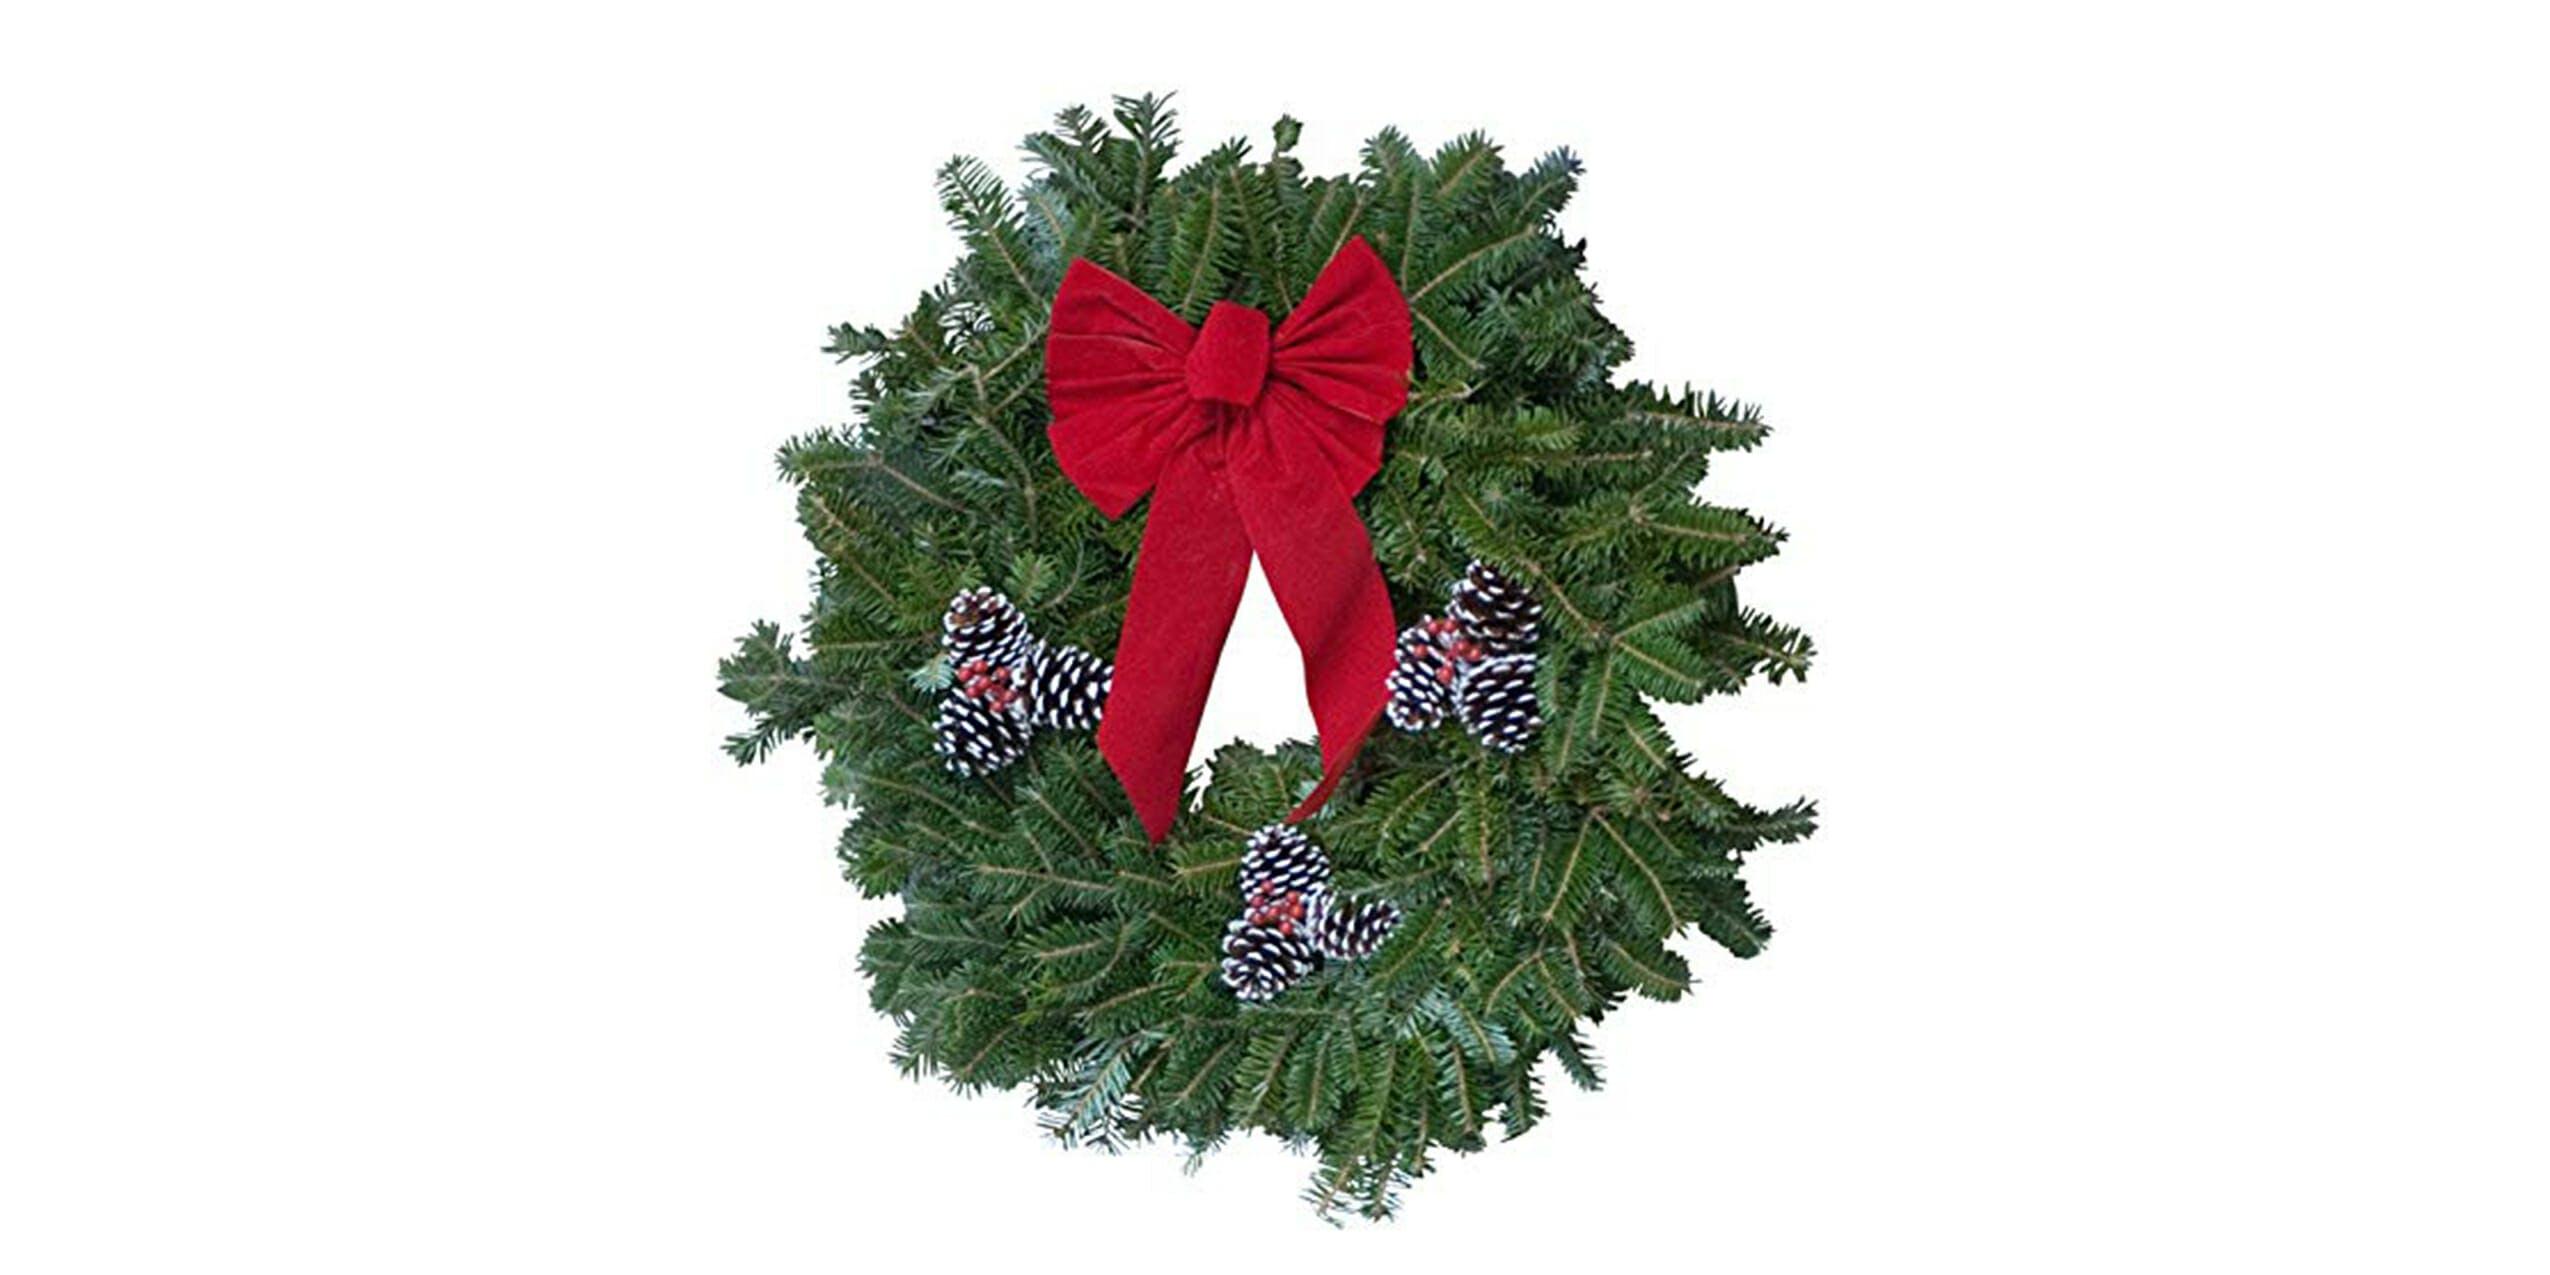 Christmas trees wreath